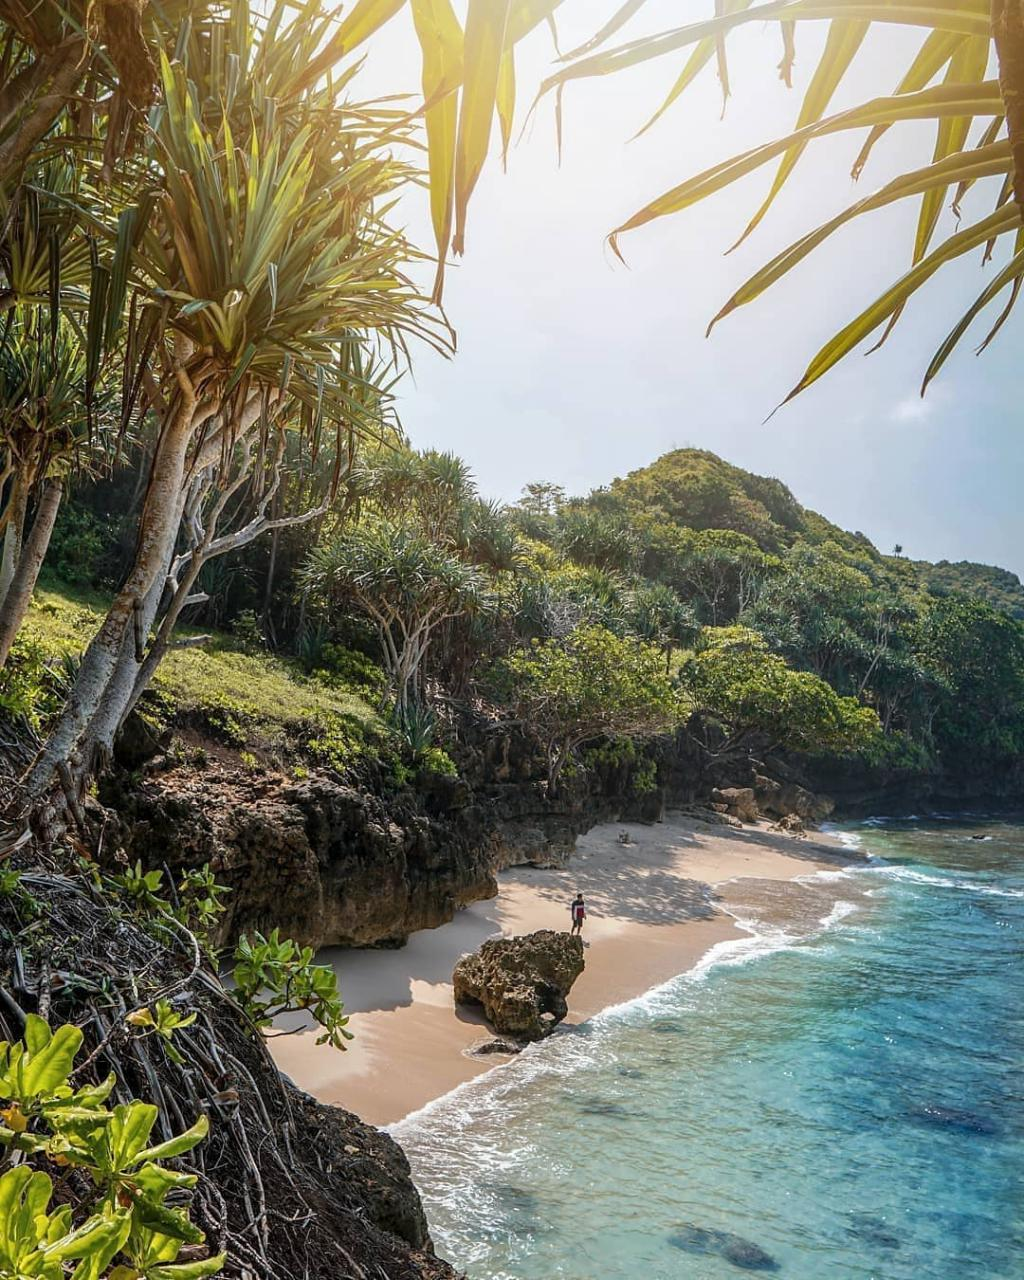 Pantai di Malang yang belum terjamah, Pantai Sumenggung / Pathukan Sumenggung.